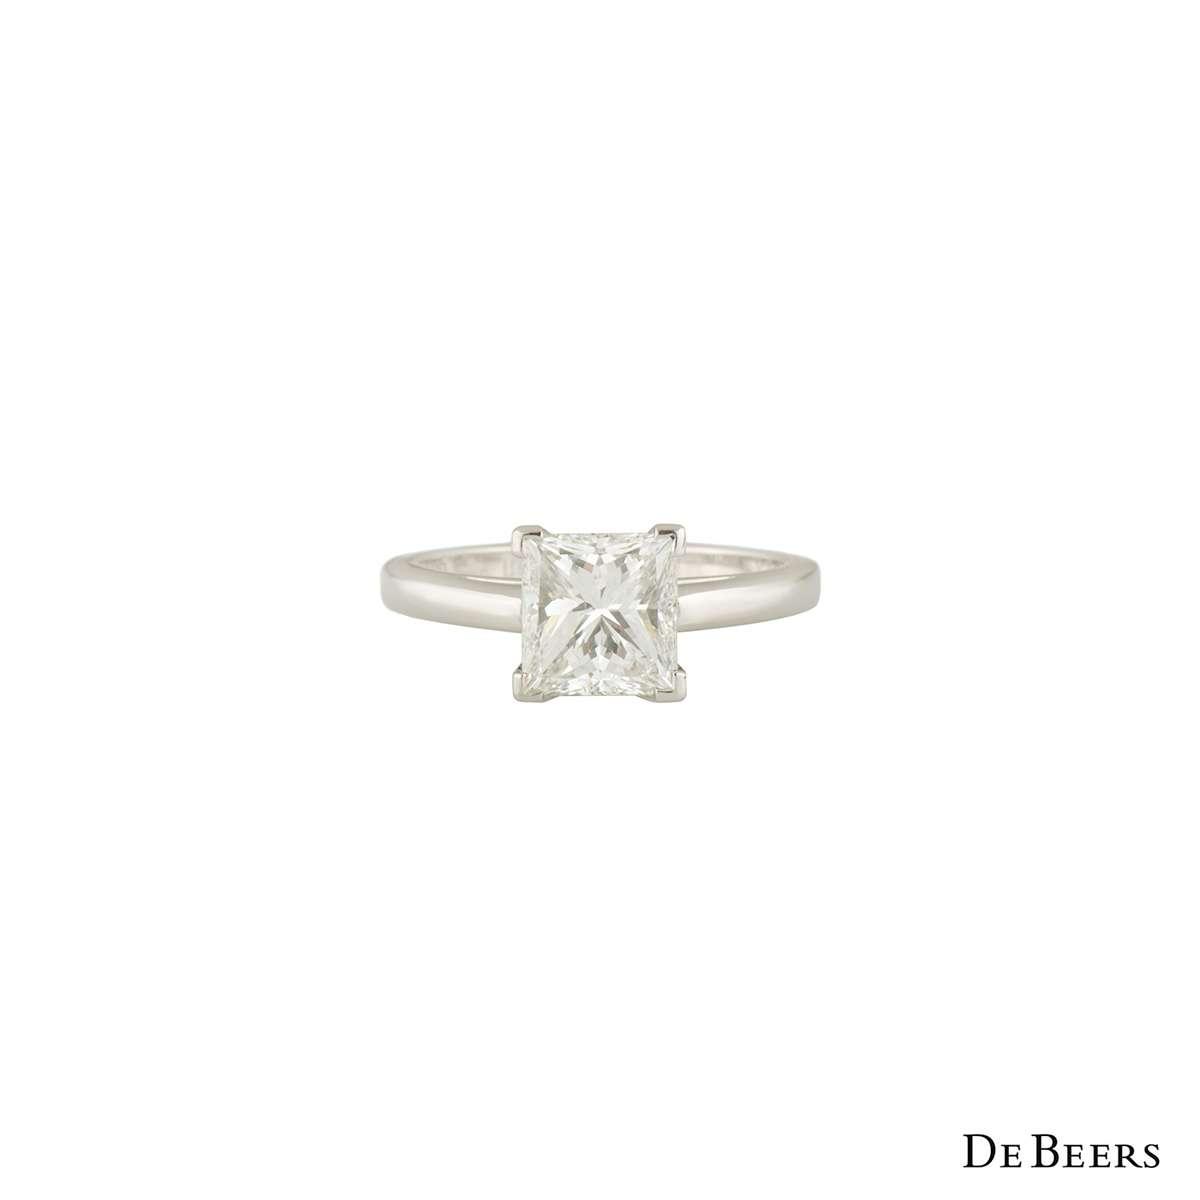 De Beers Diamond Platinum Princess Cut Ring 2.50ct G/VVS1